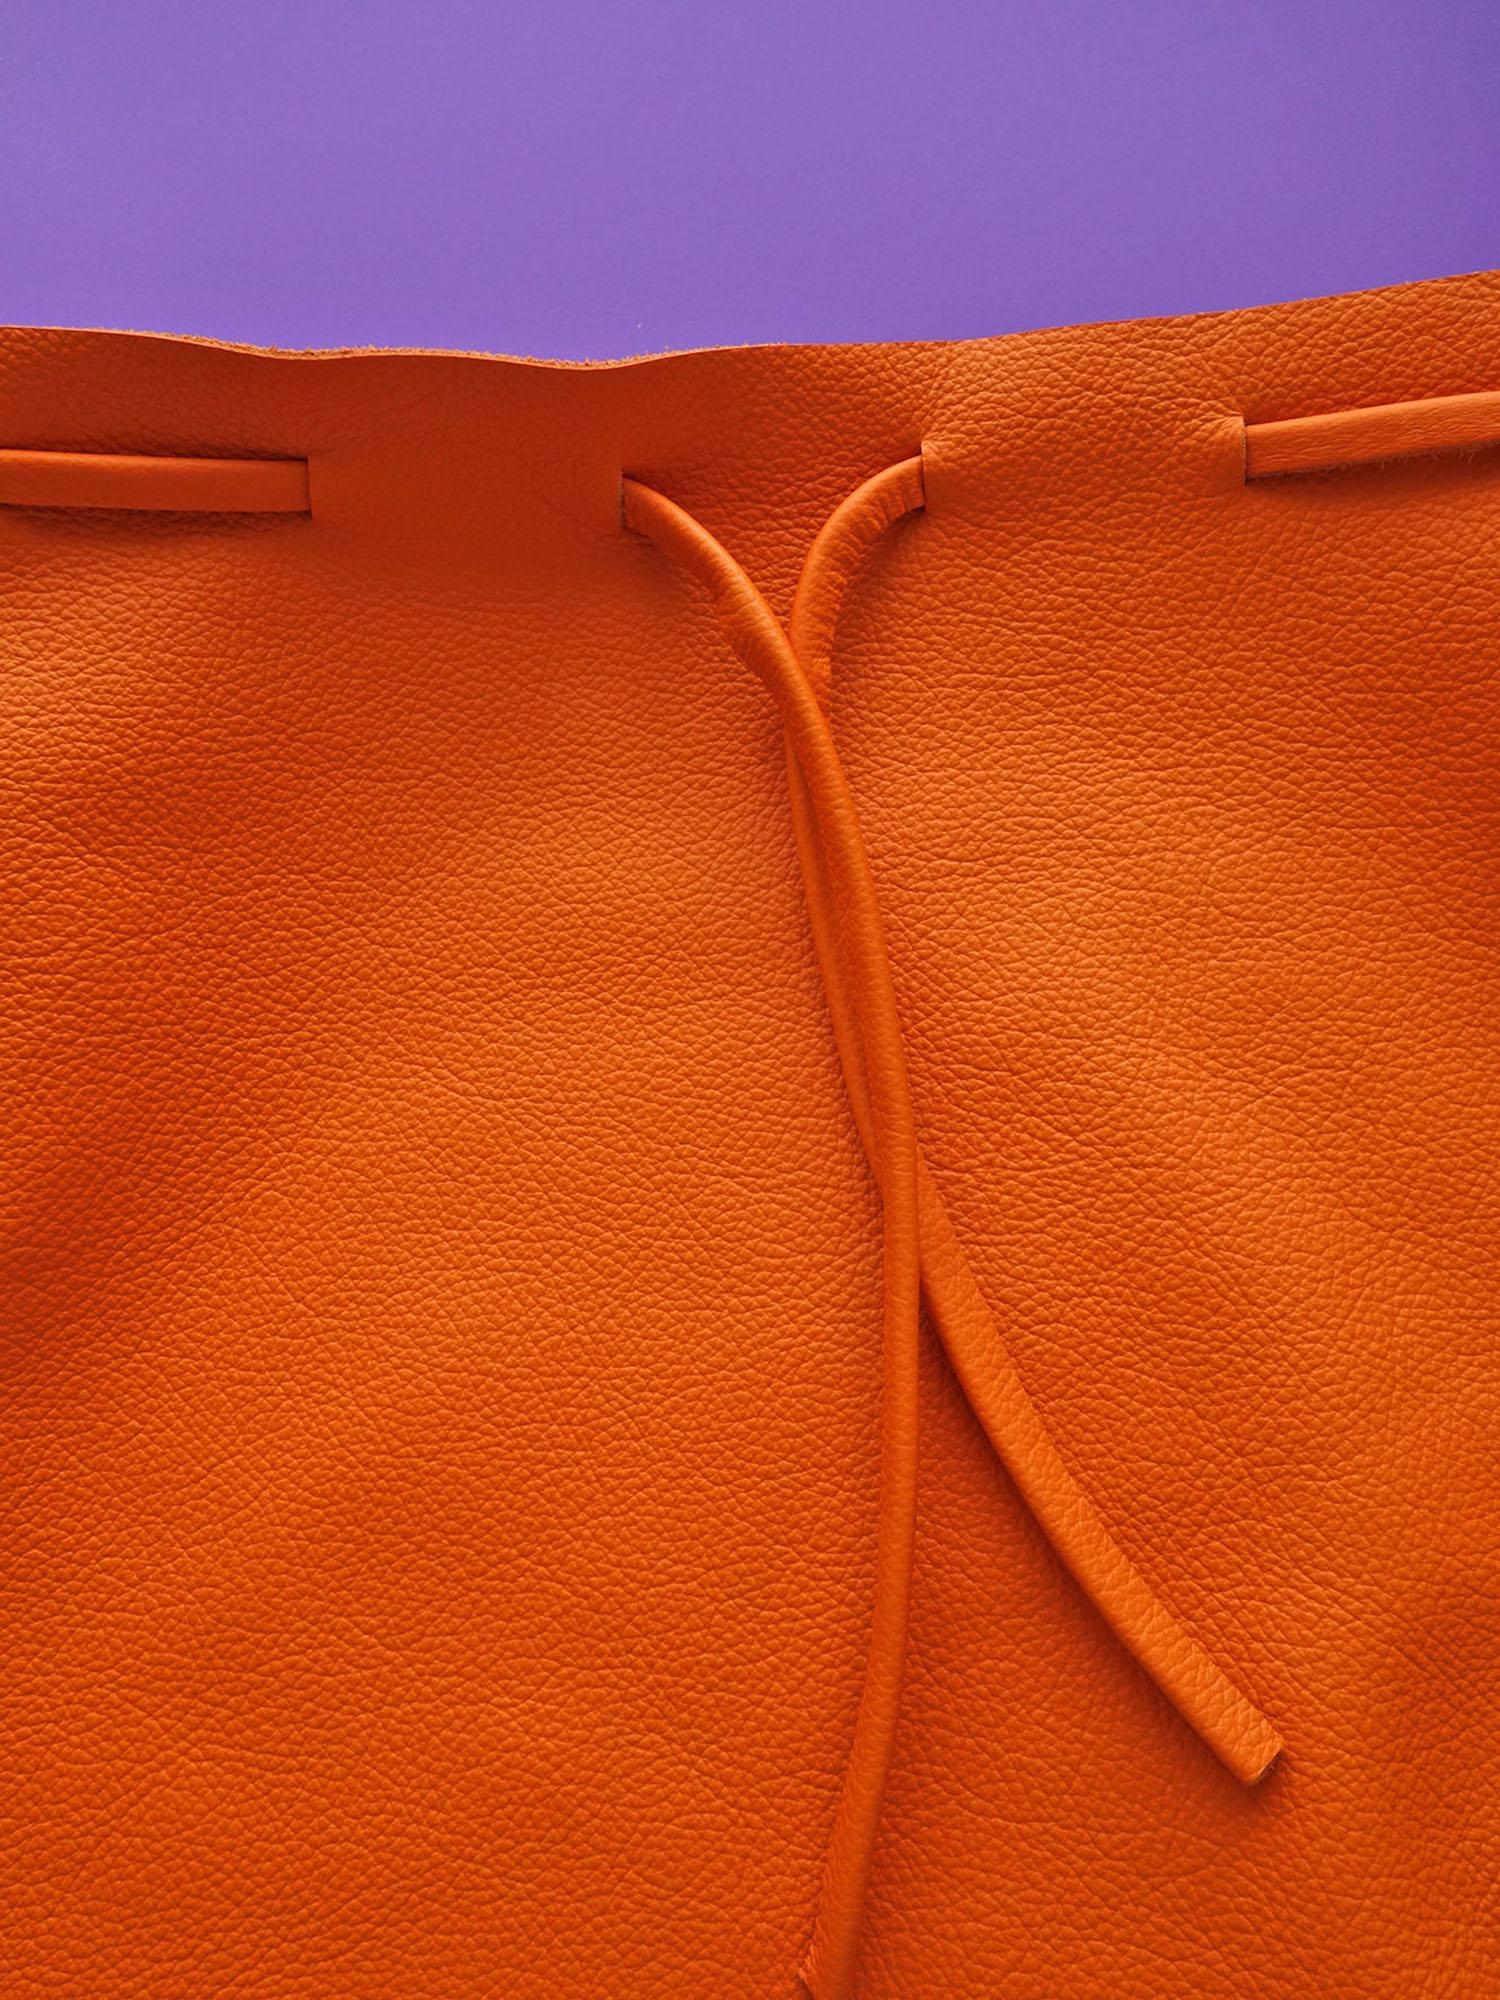 Liodebruin_Leather_Drawstringbags_03.jpg